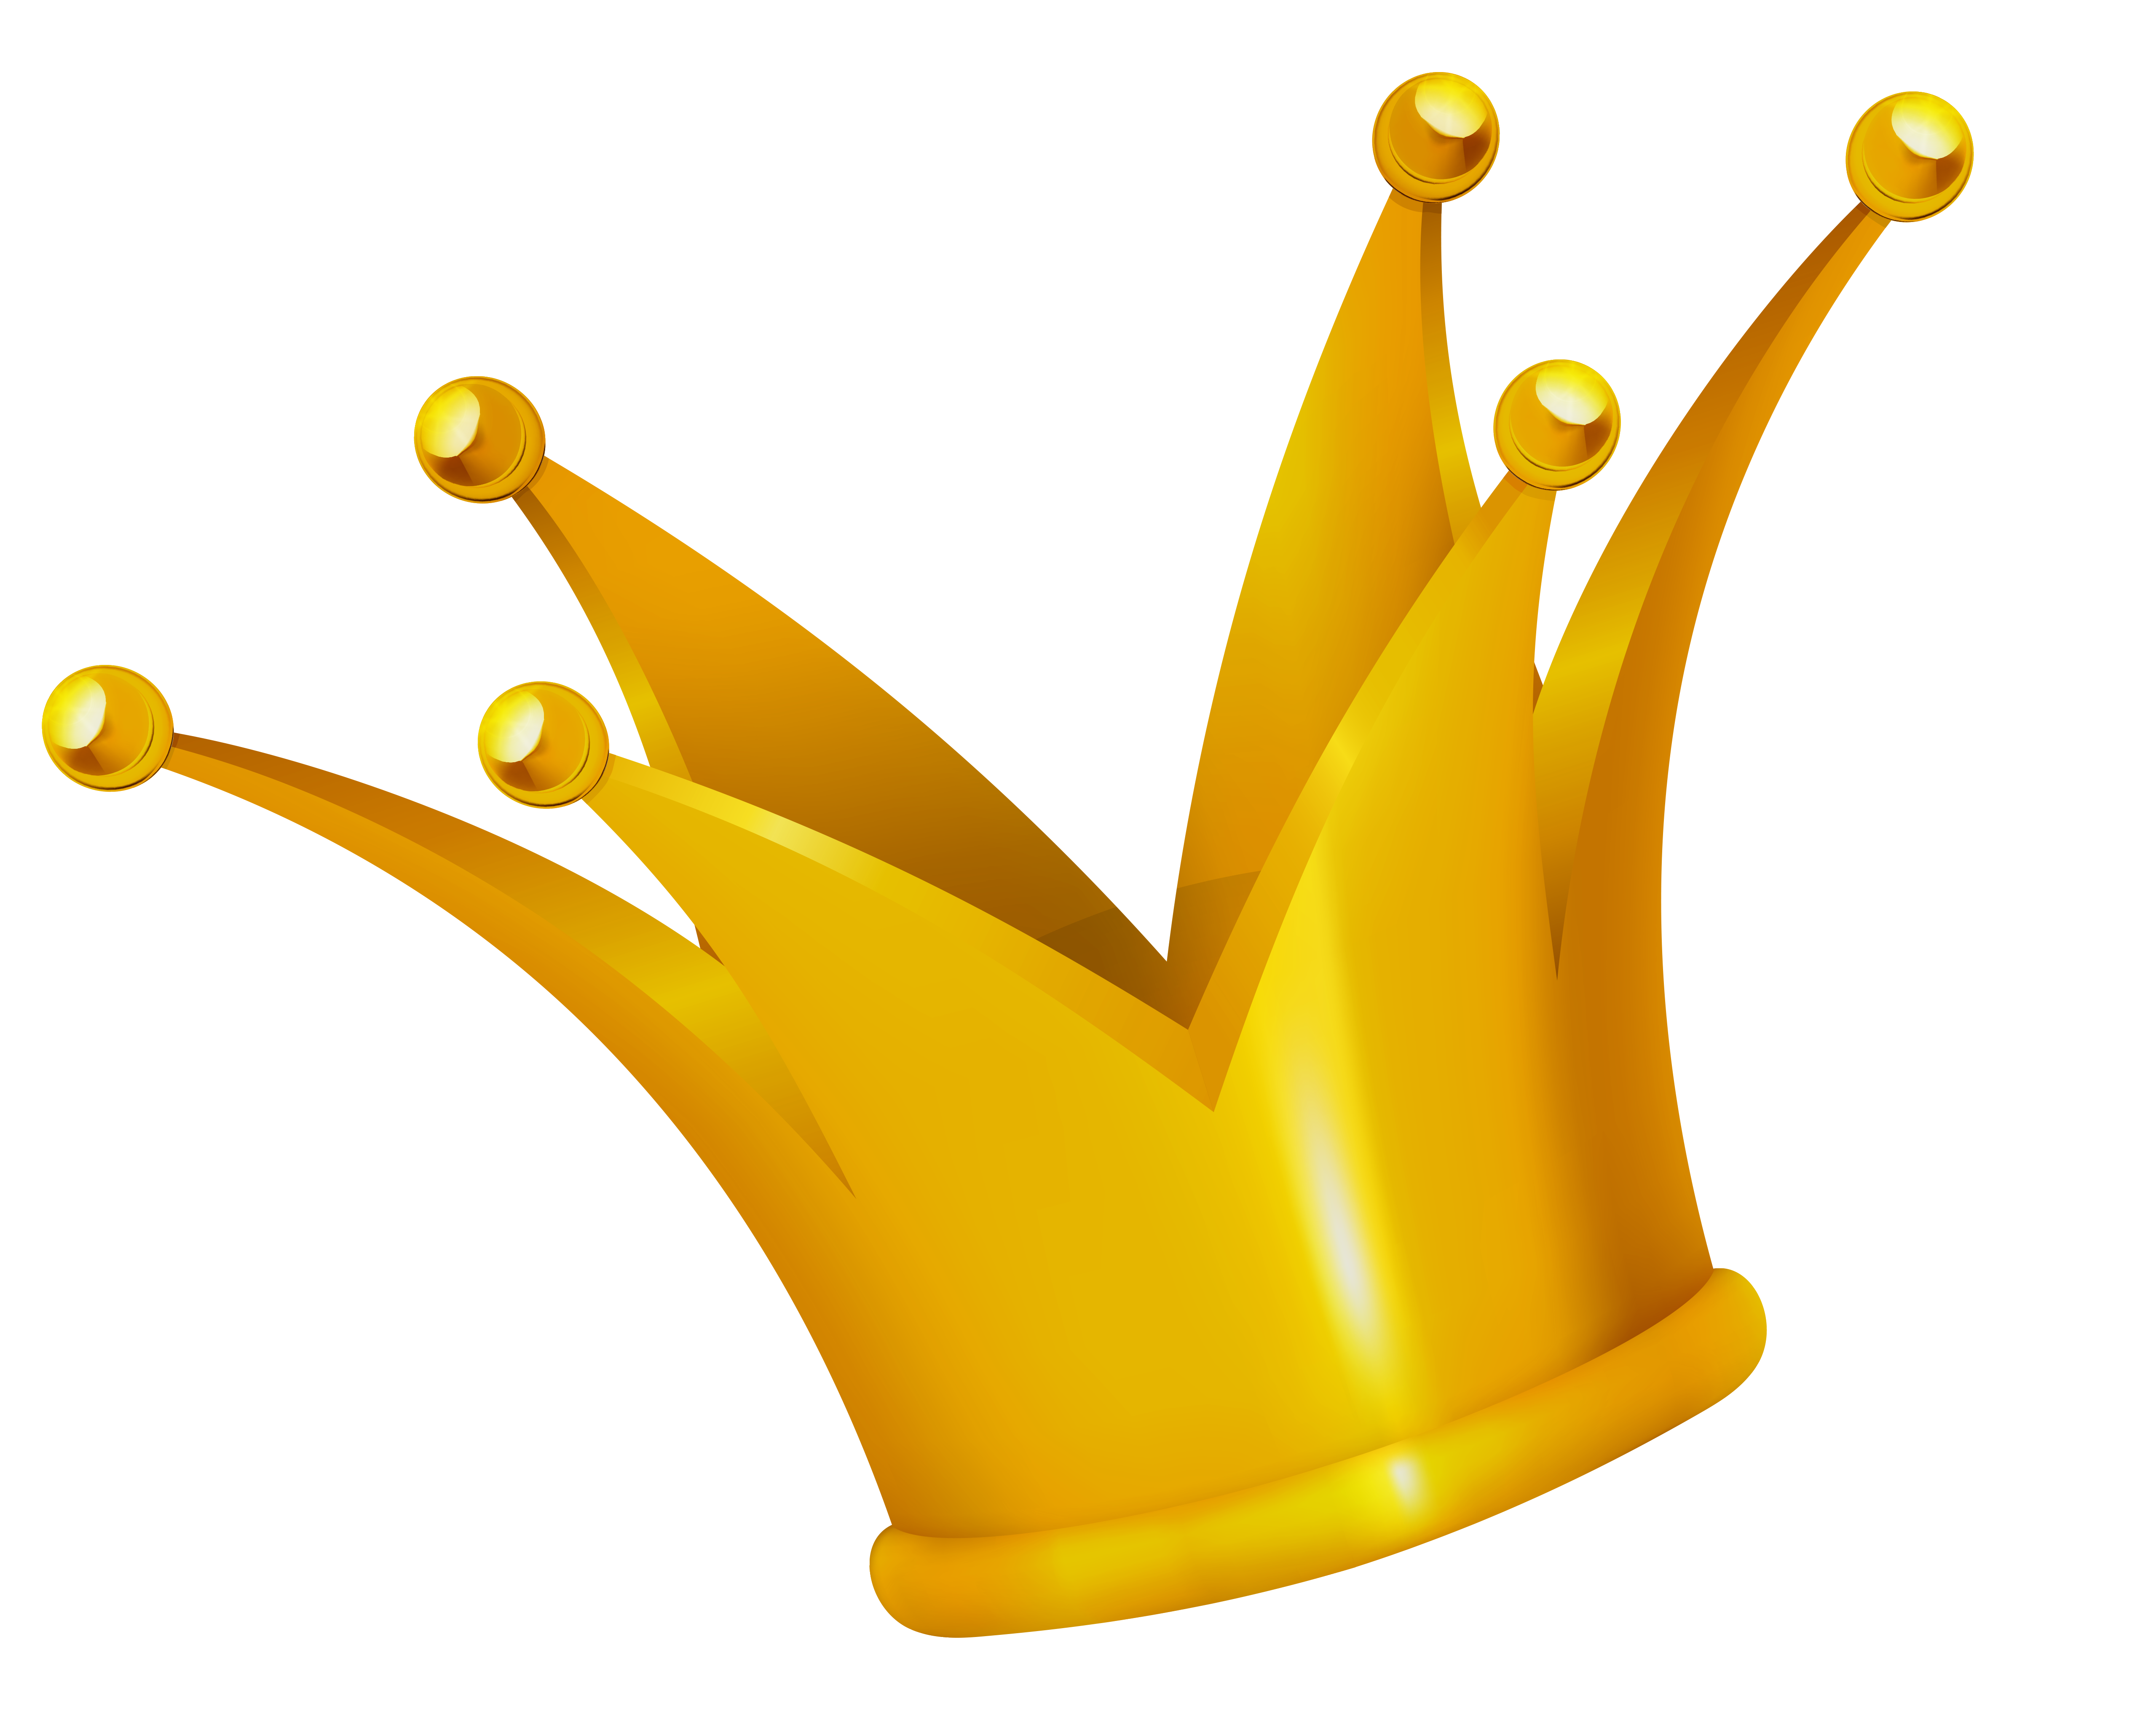 5098x4120 Top Crown Clip Art Free Clipart Image 3